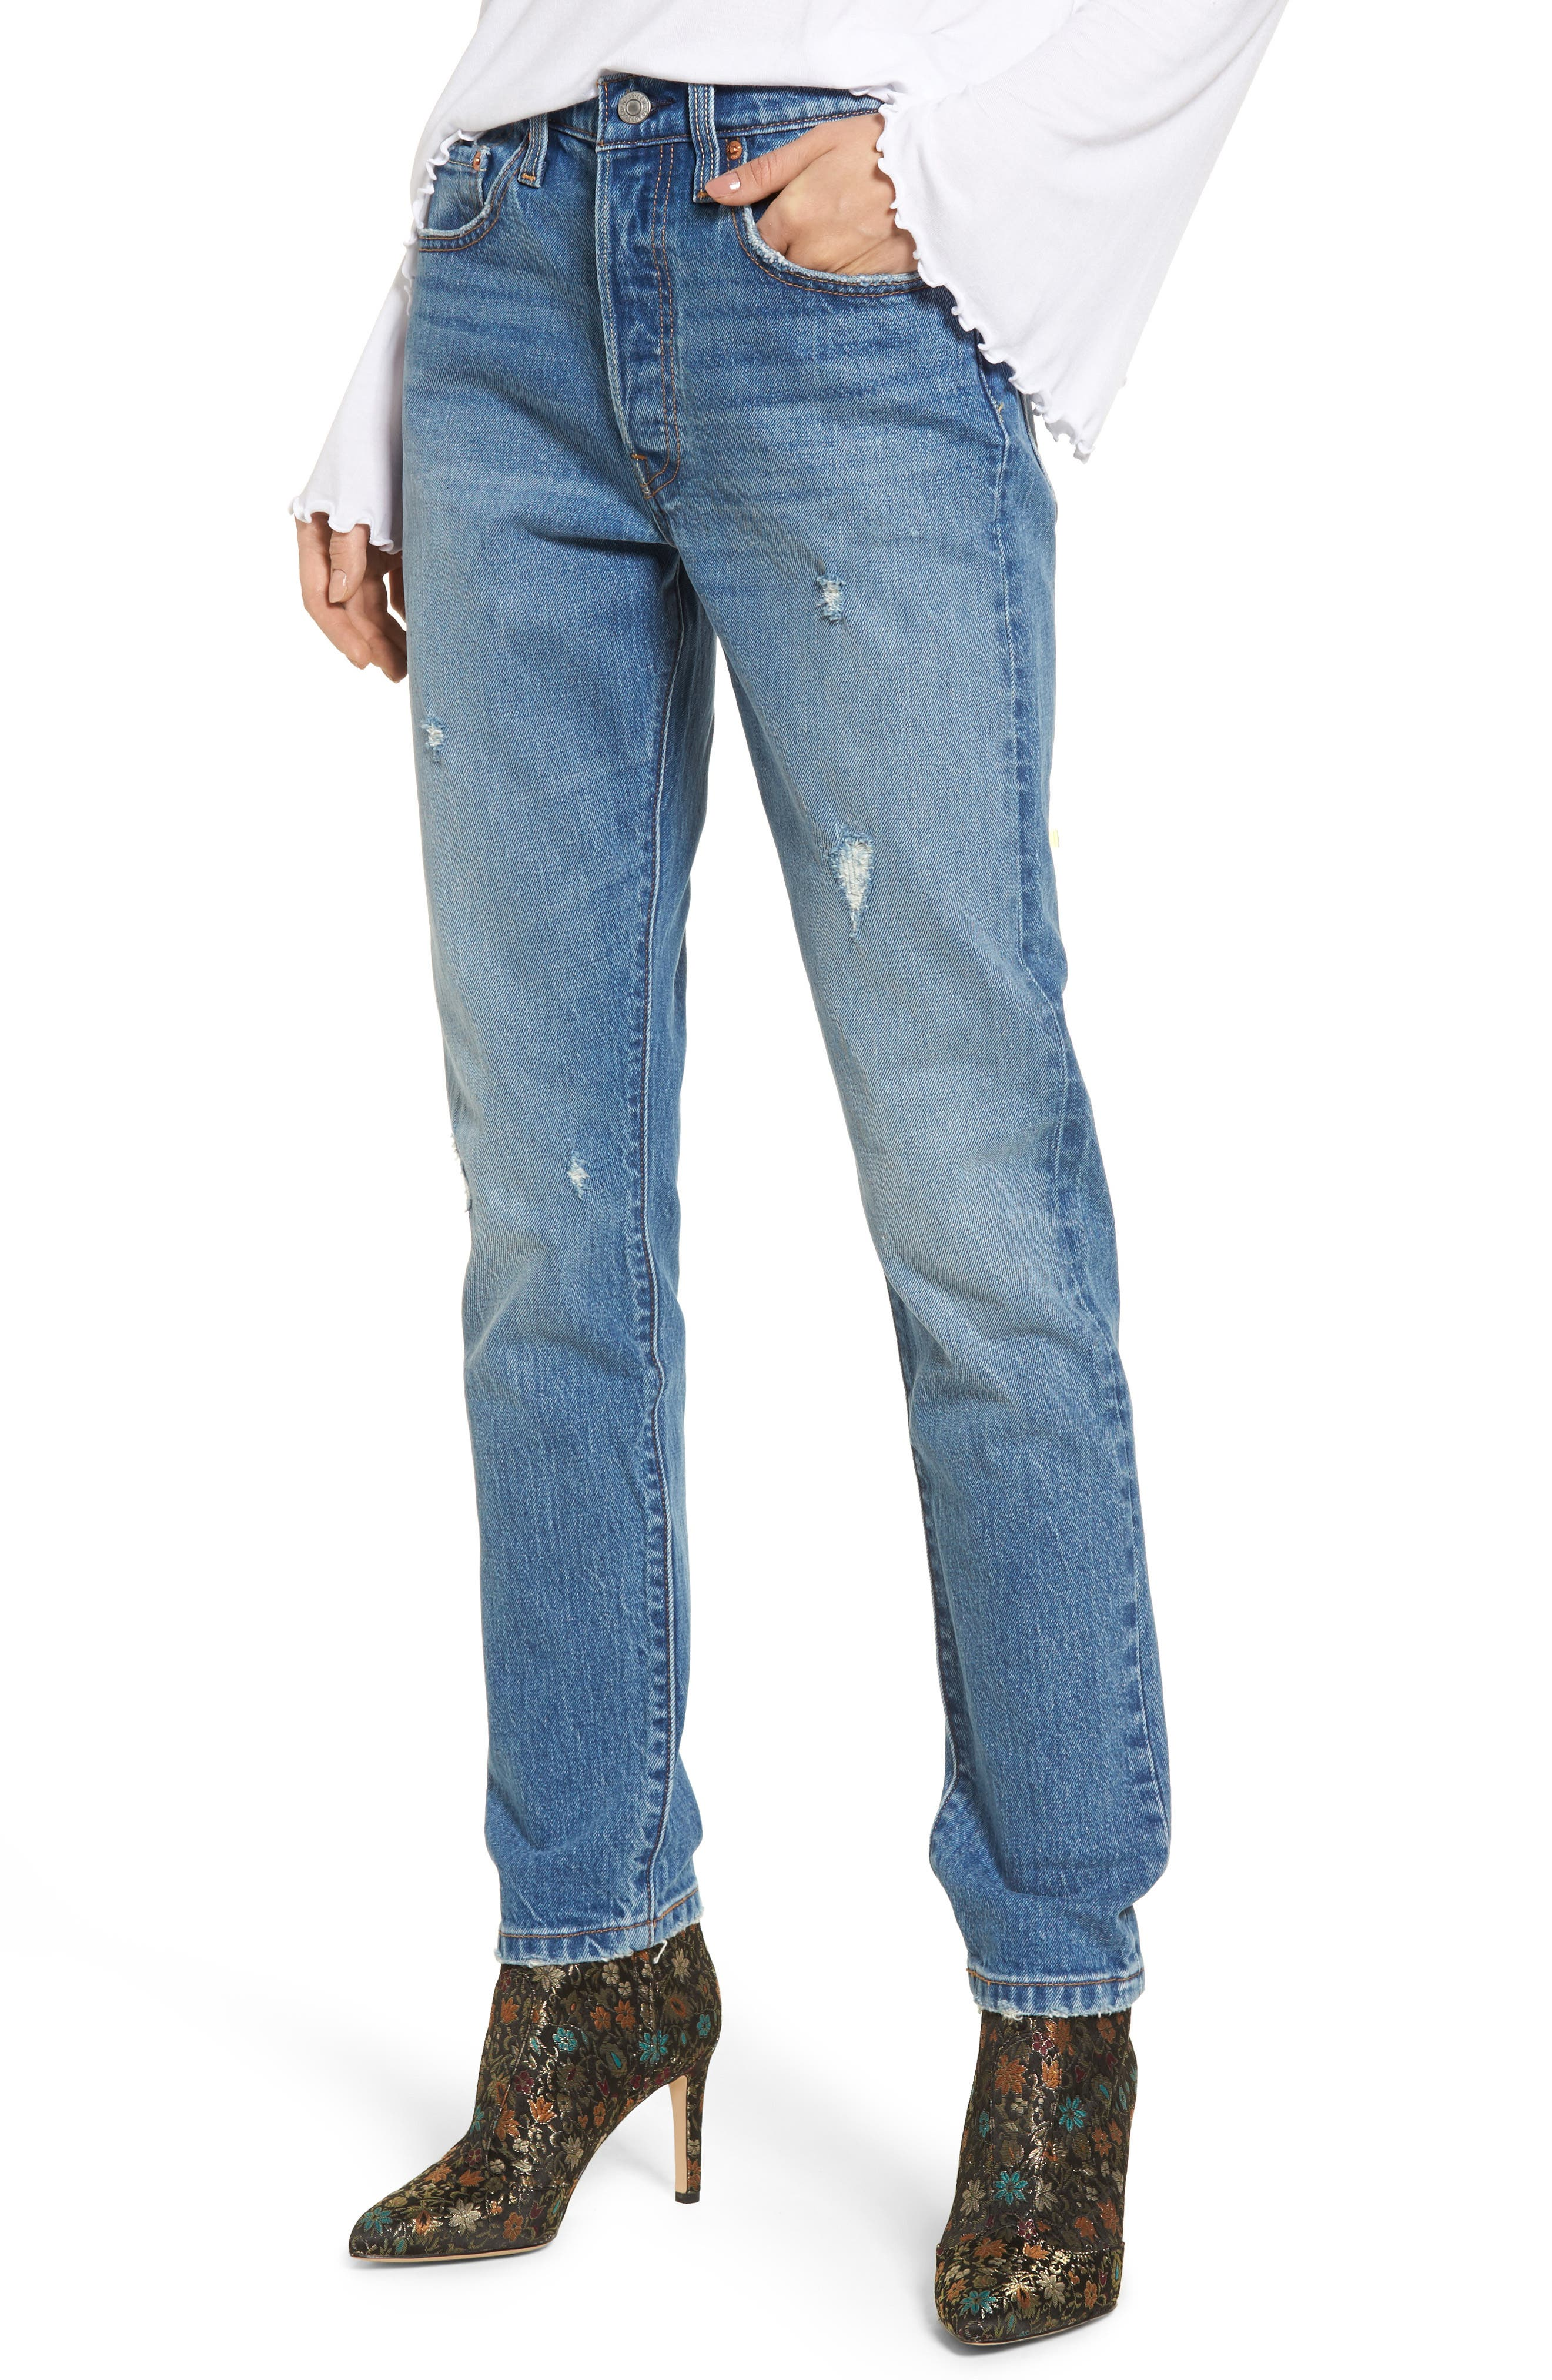 Levi's® 501 High Waist Skinny Jeans (Leave a Trace)